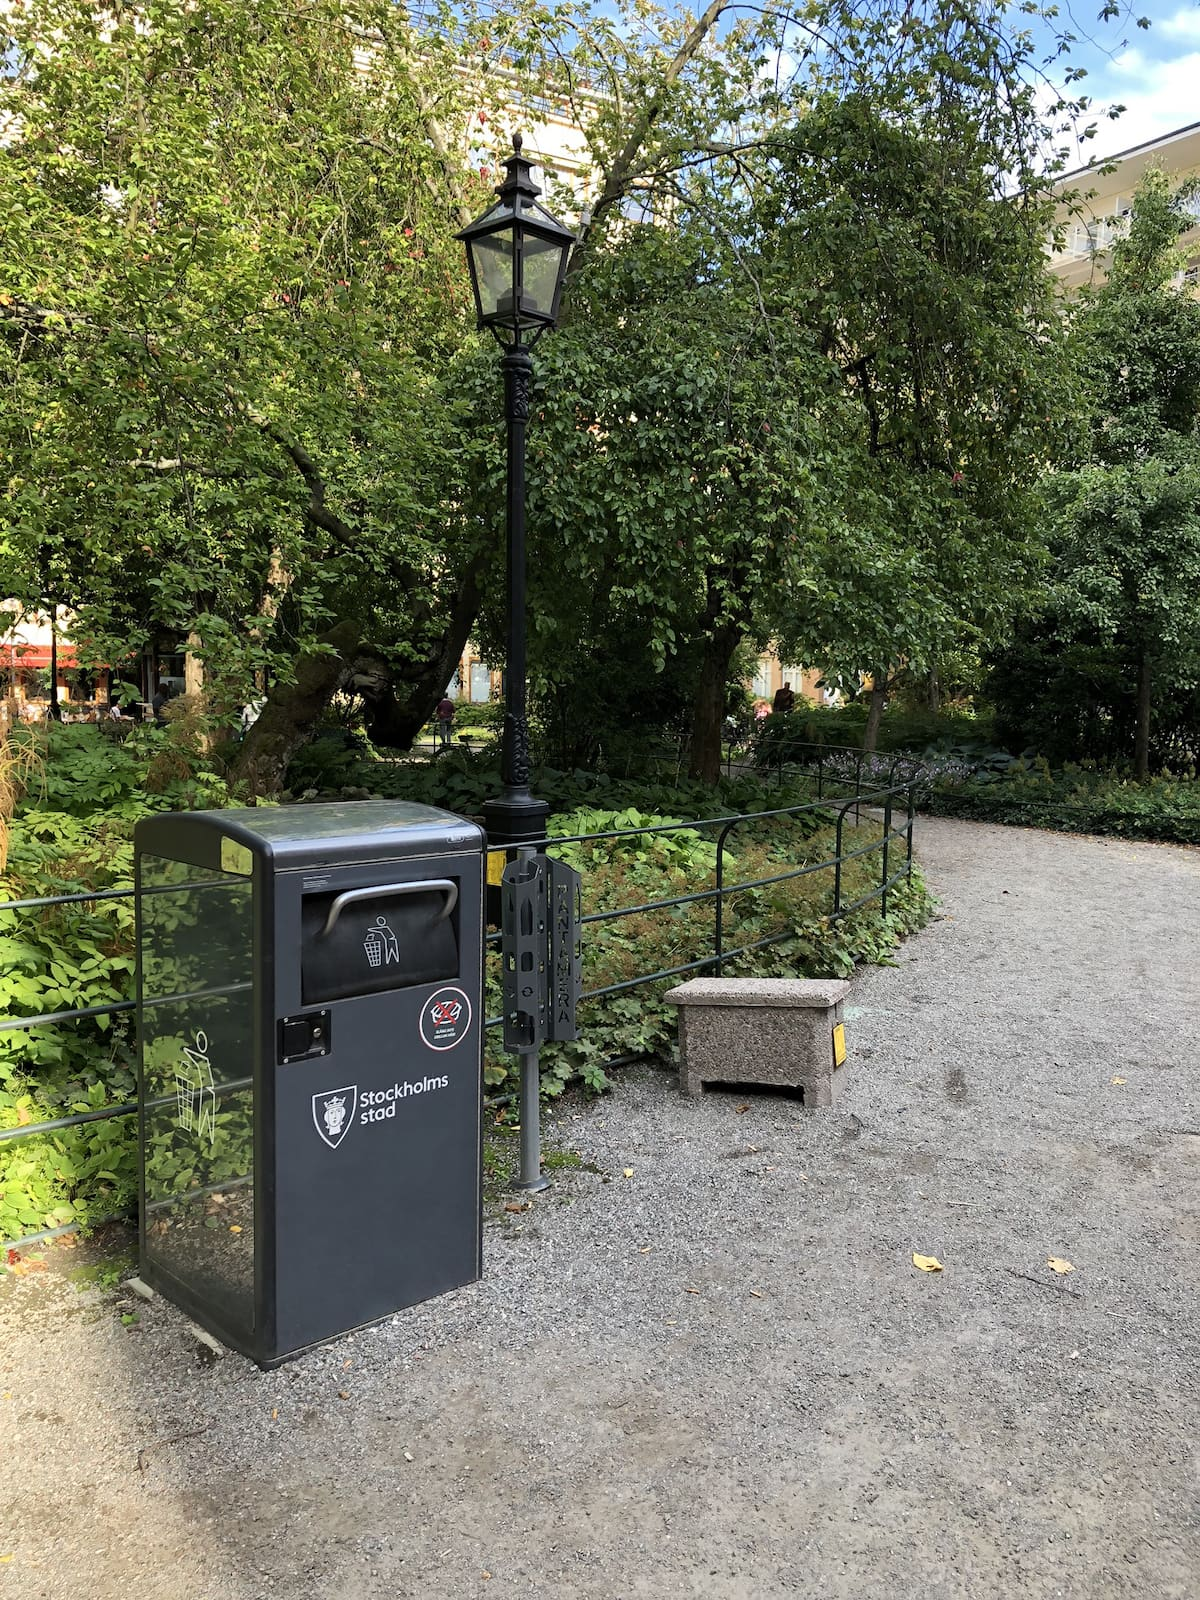 Solar-drevne trash kurv i Stockholm Bigbelly